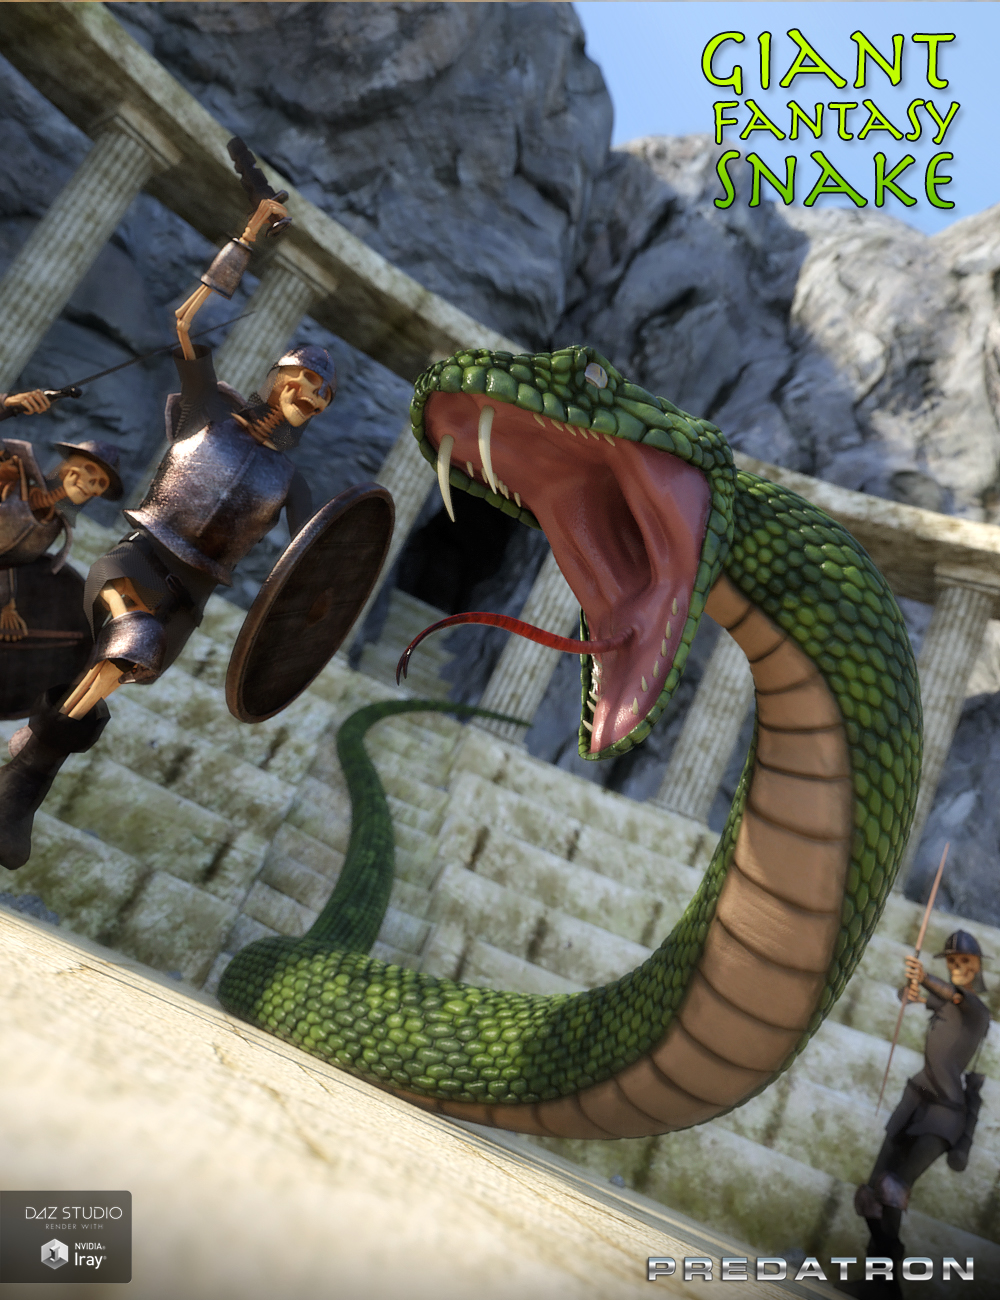 Giant Fantasy Snake by: Predatron, 3D Models by Daz 3D